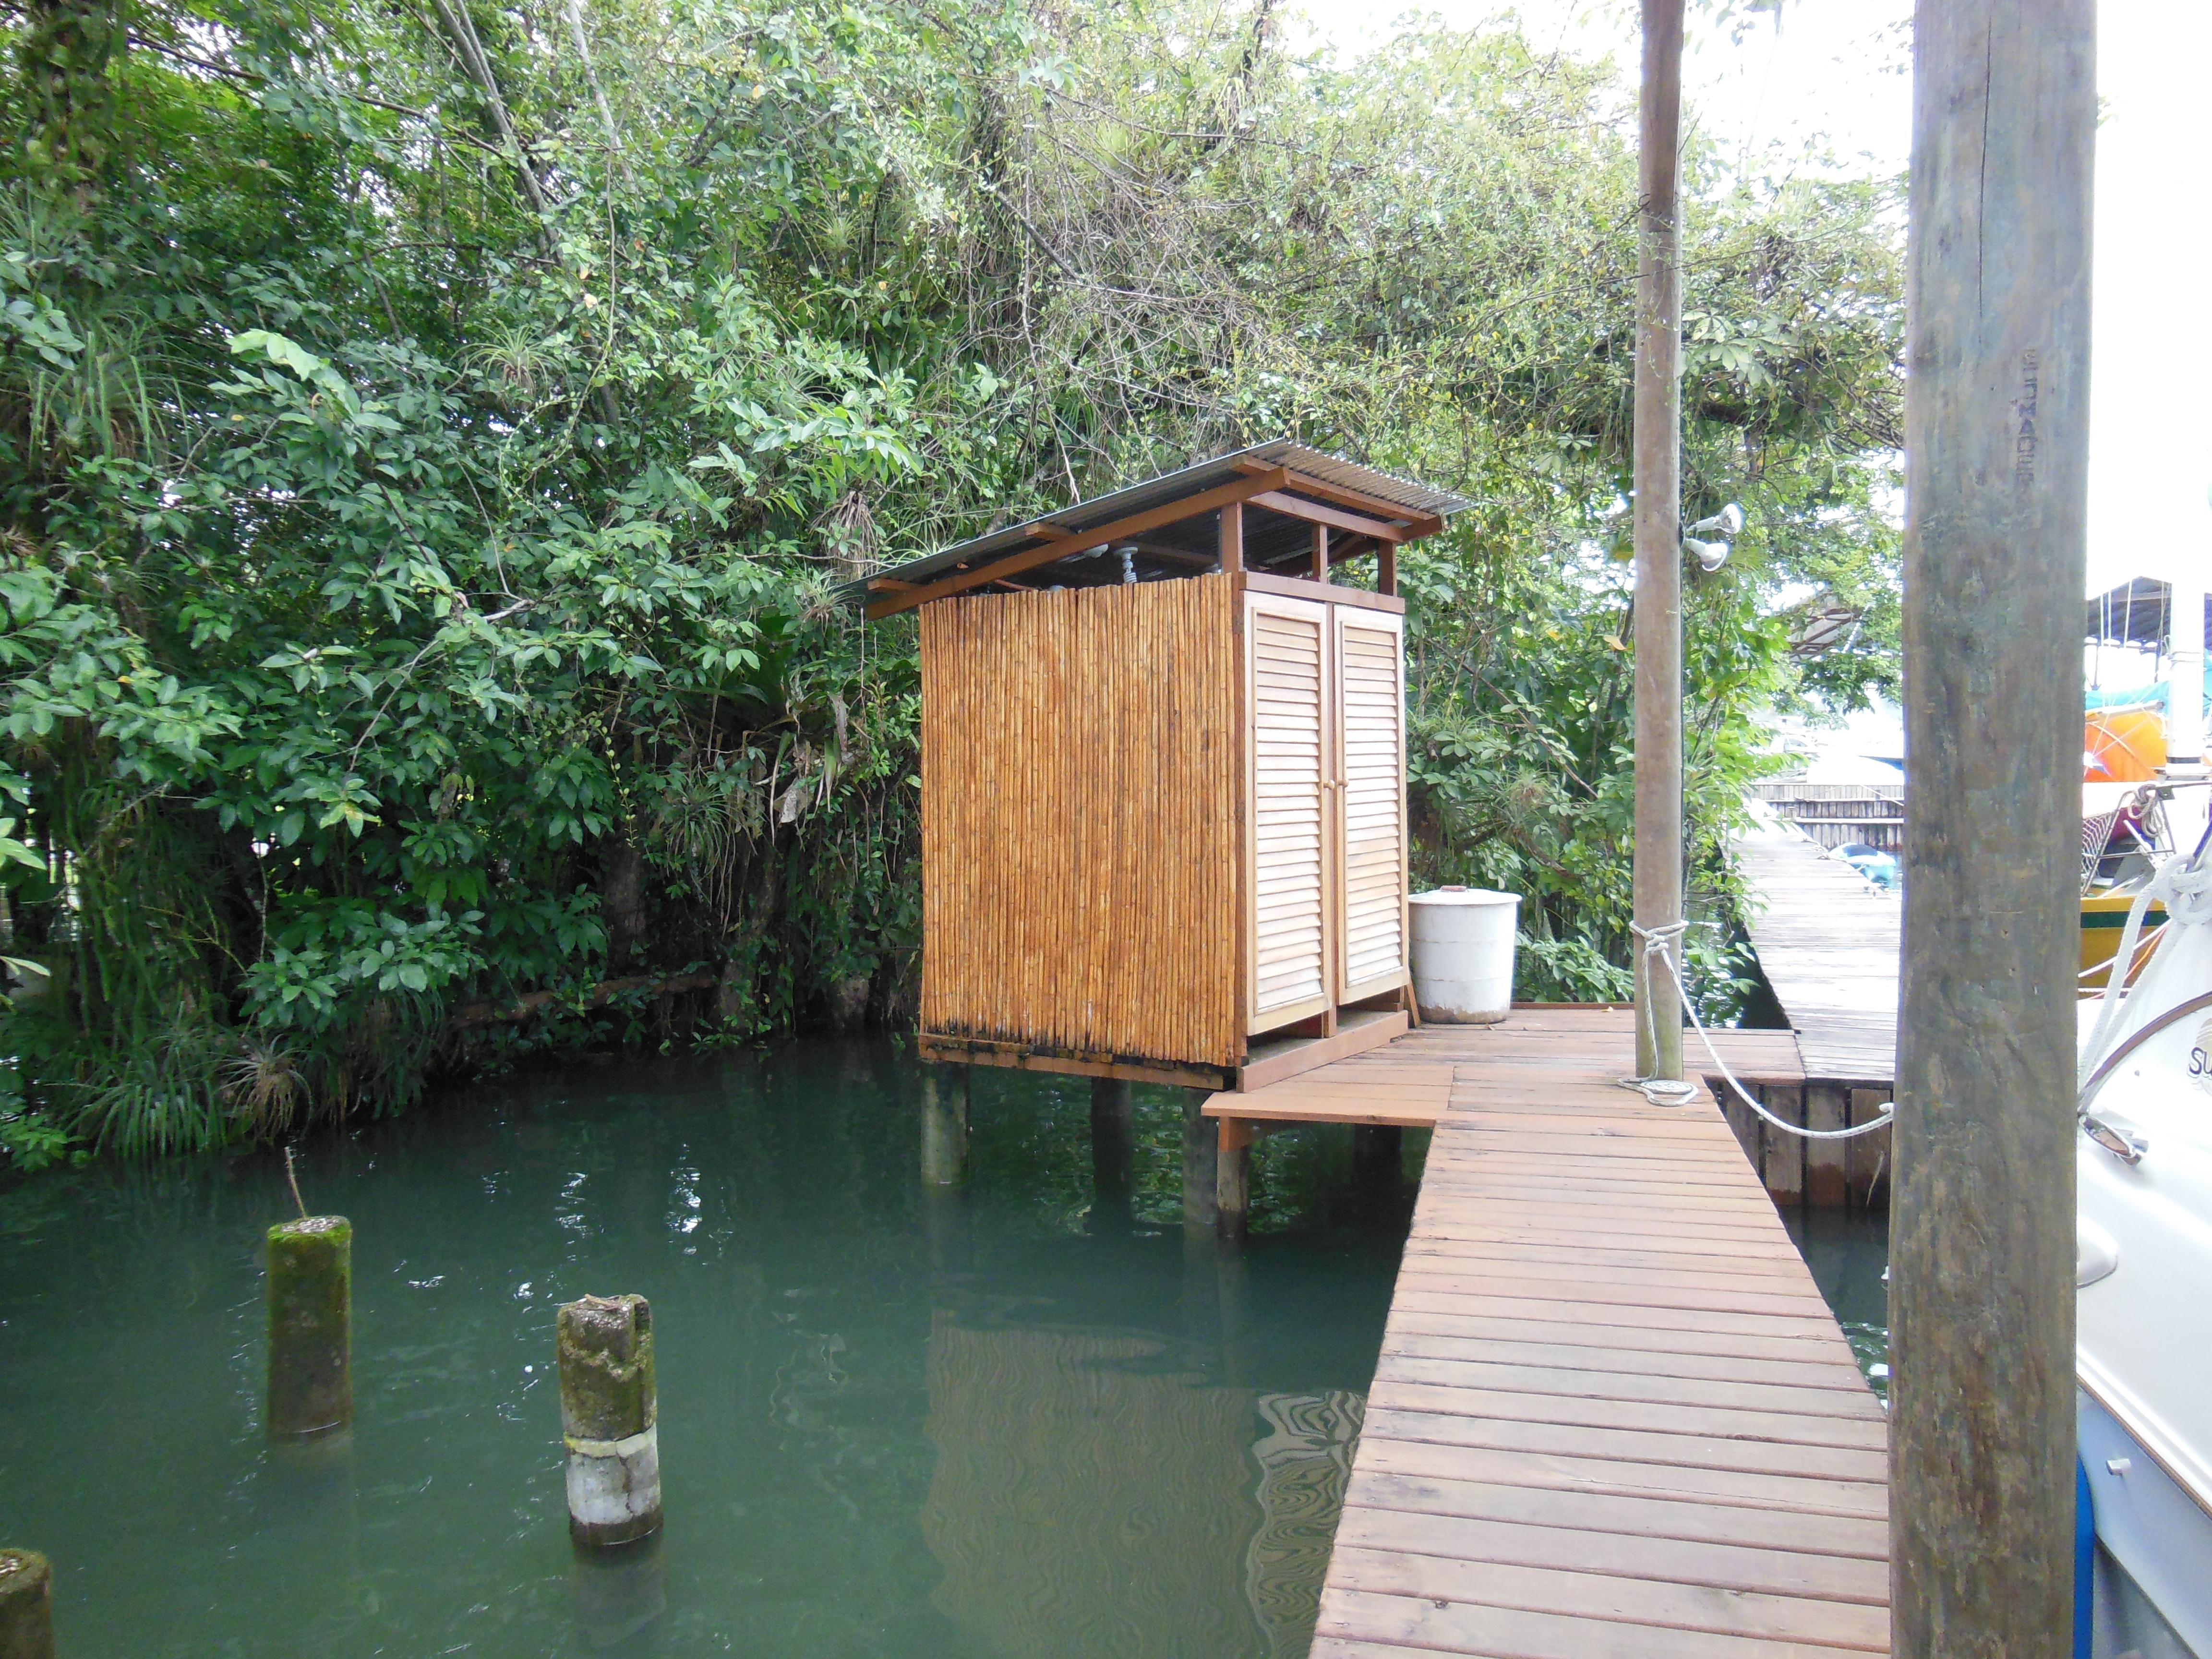 Bamboo shower shack